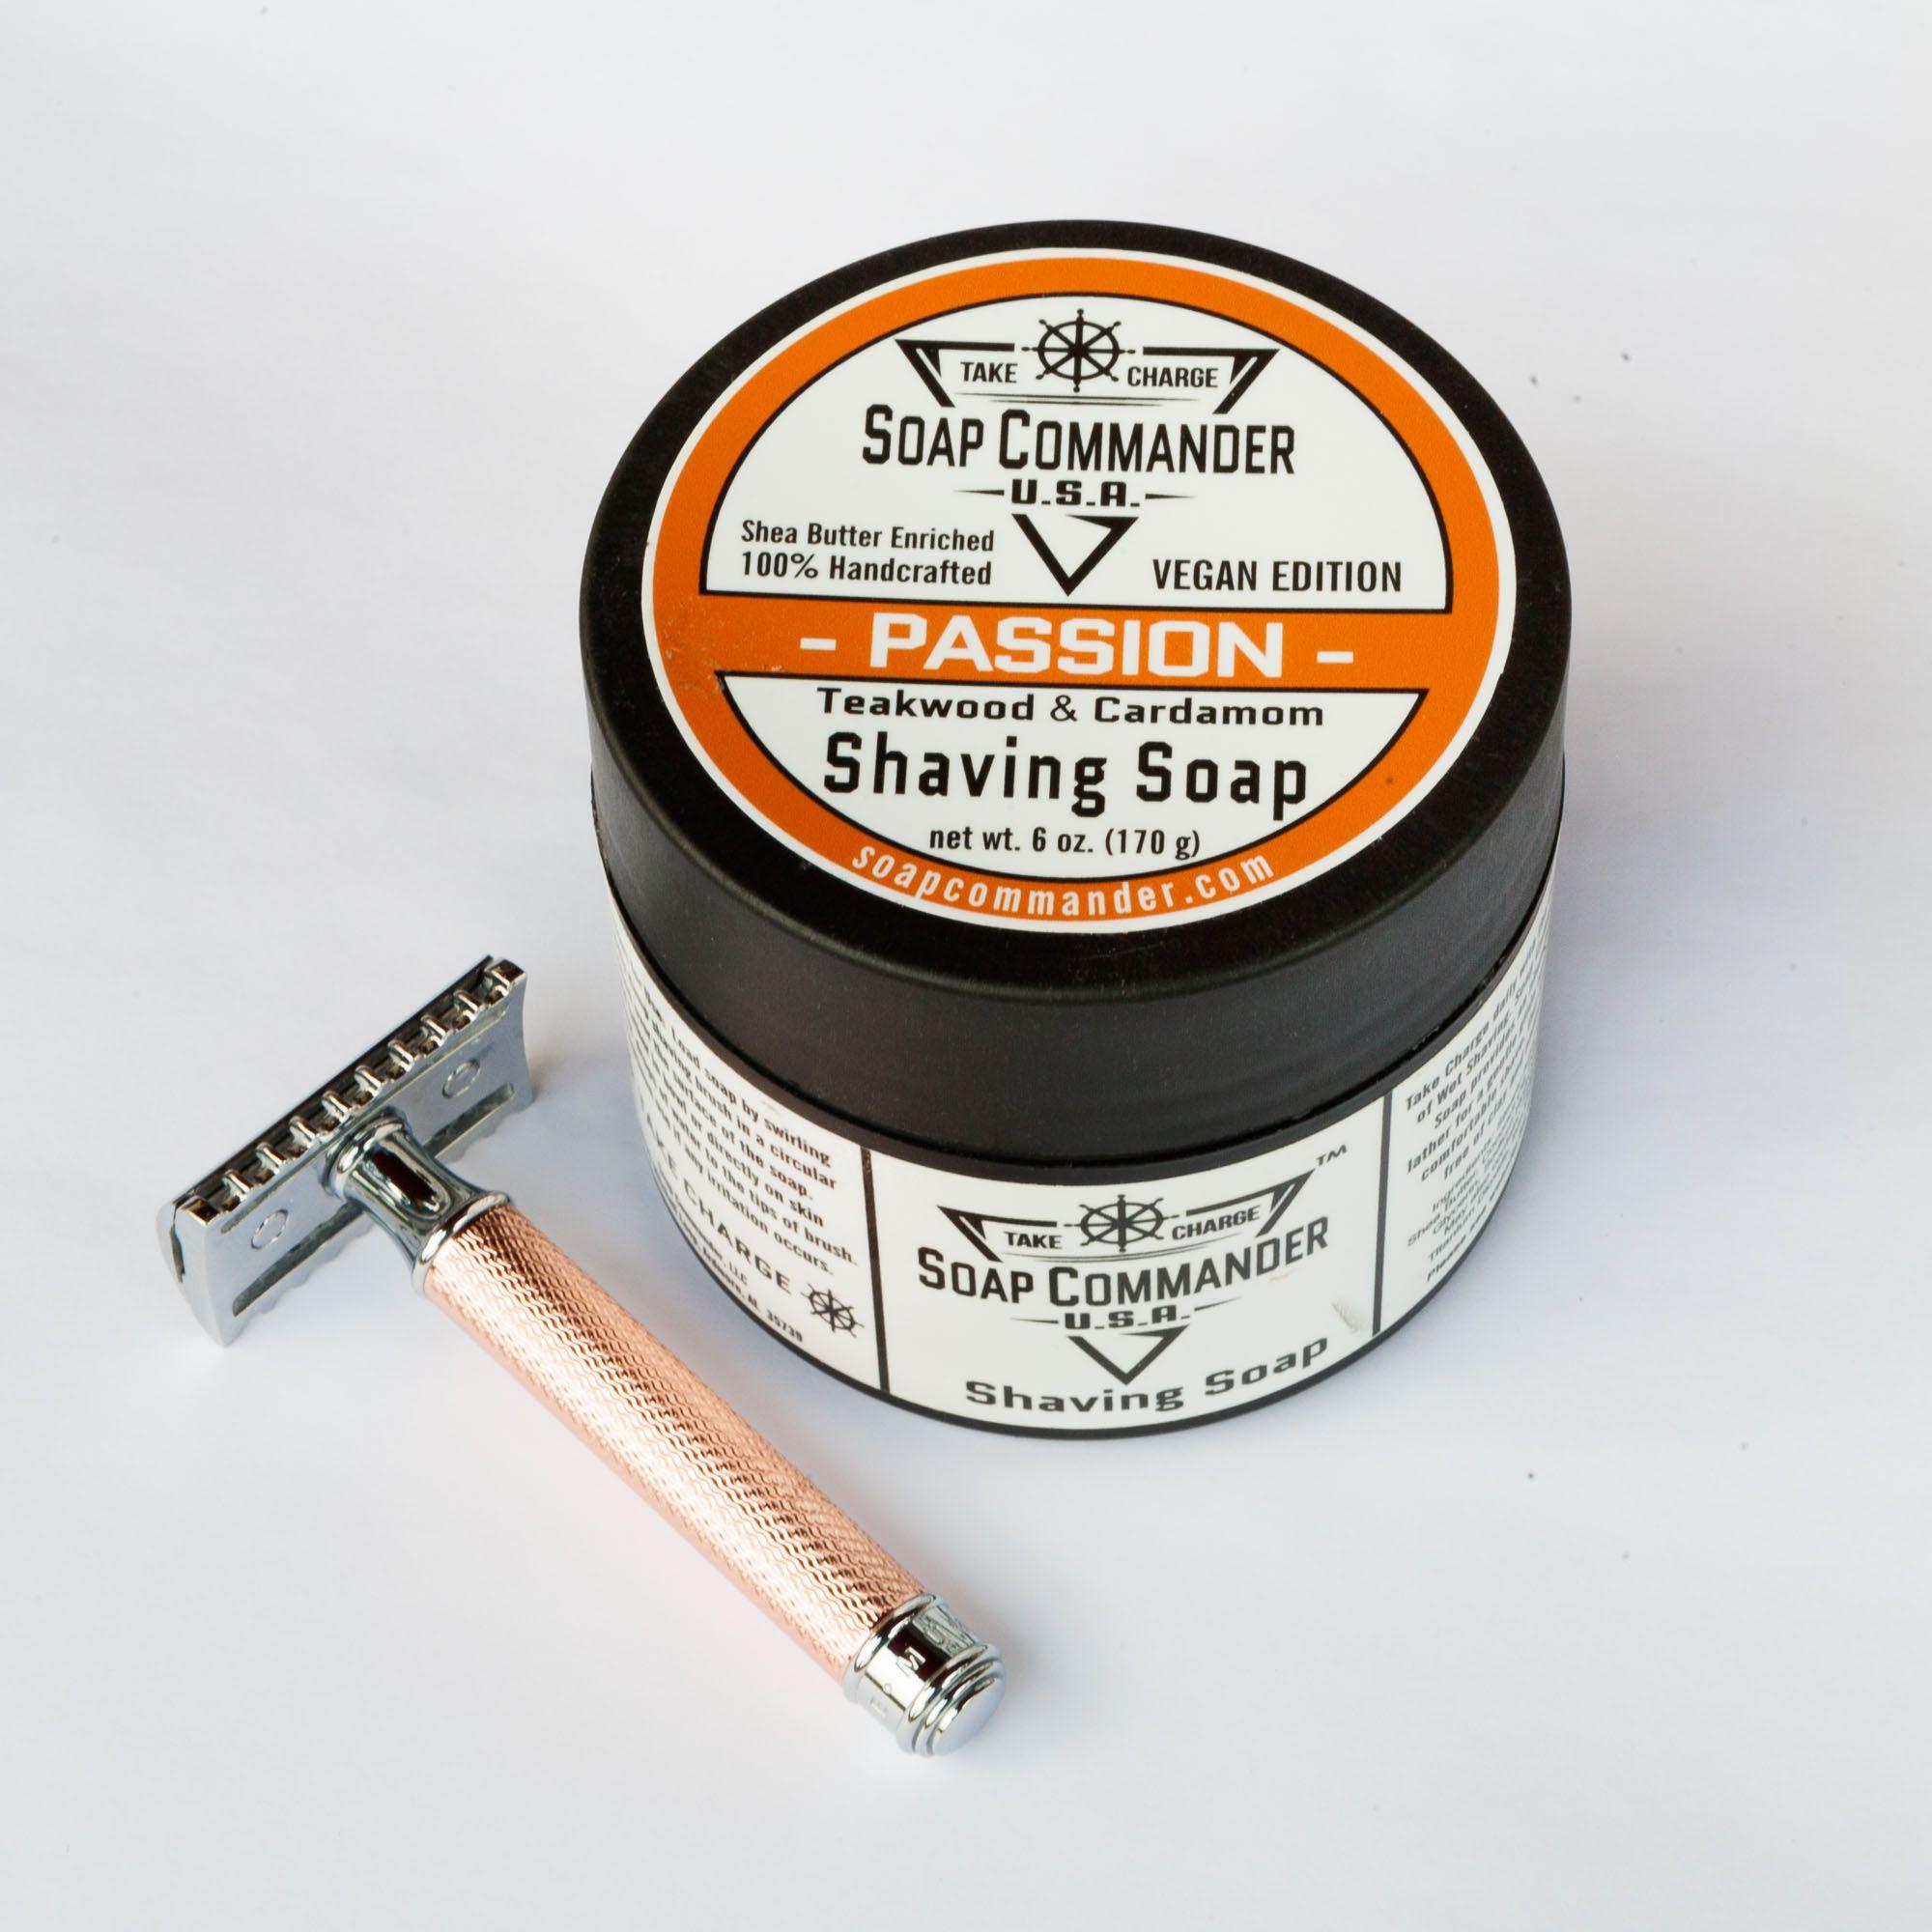 Tygiel mydła do golenia Soap Commander Passion Shaving Soap